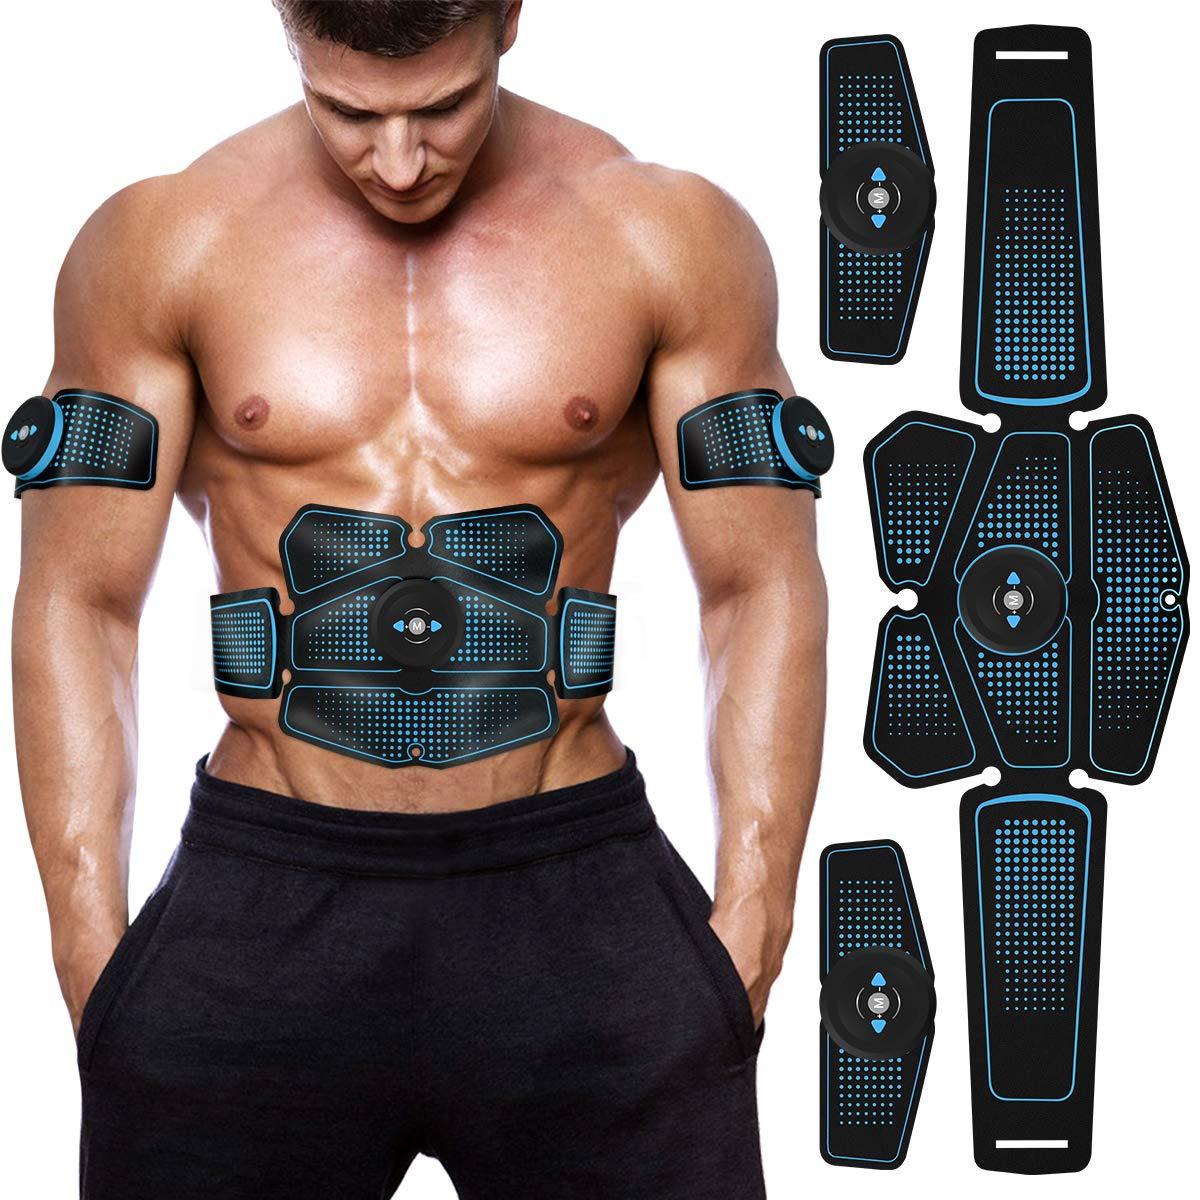 Körper Gebäude Fitness Ausrüstungen Elektrische Muscle Toner Maschine Drahtlose Toning Gürtel 6 Sechs Pack Abs Fett Brenner